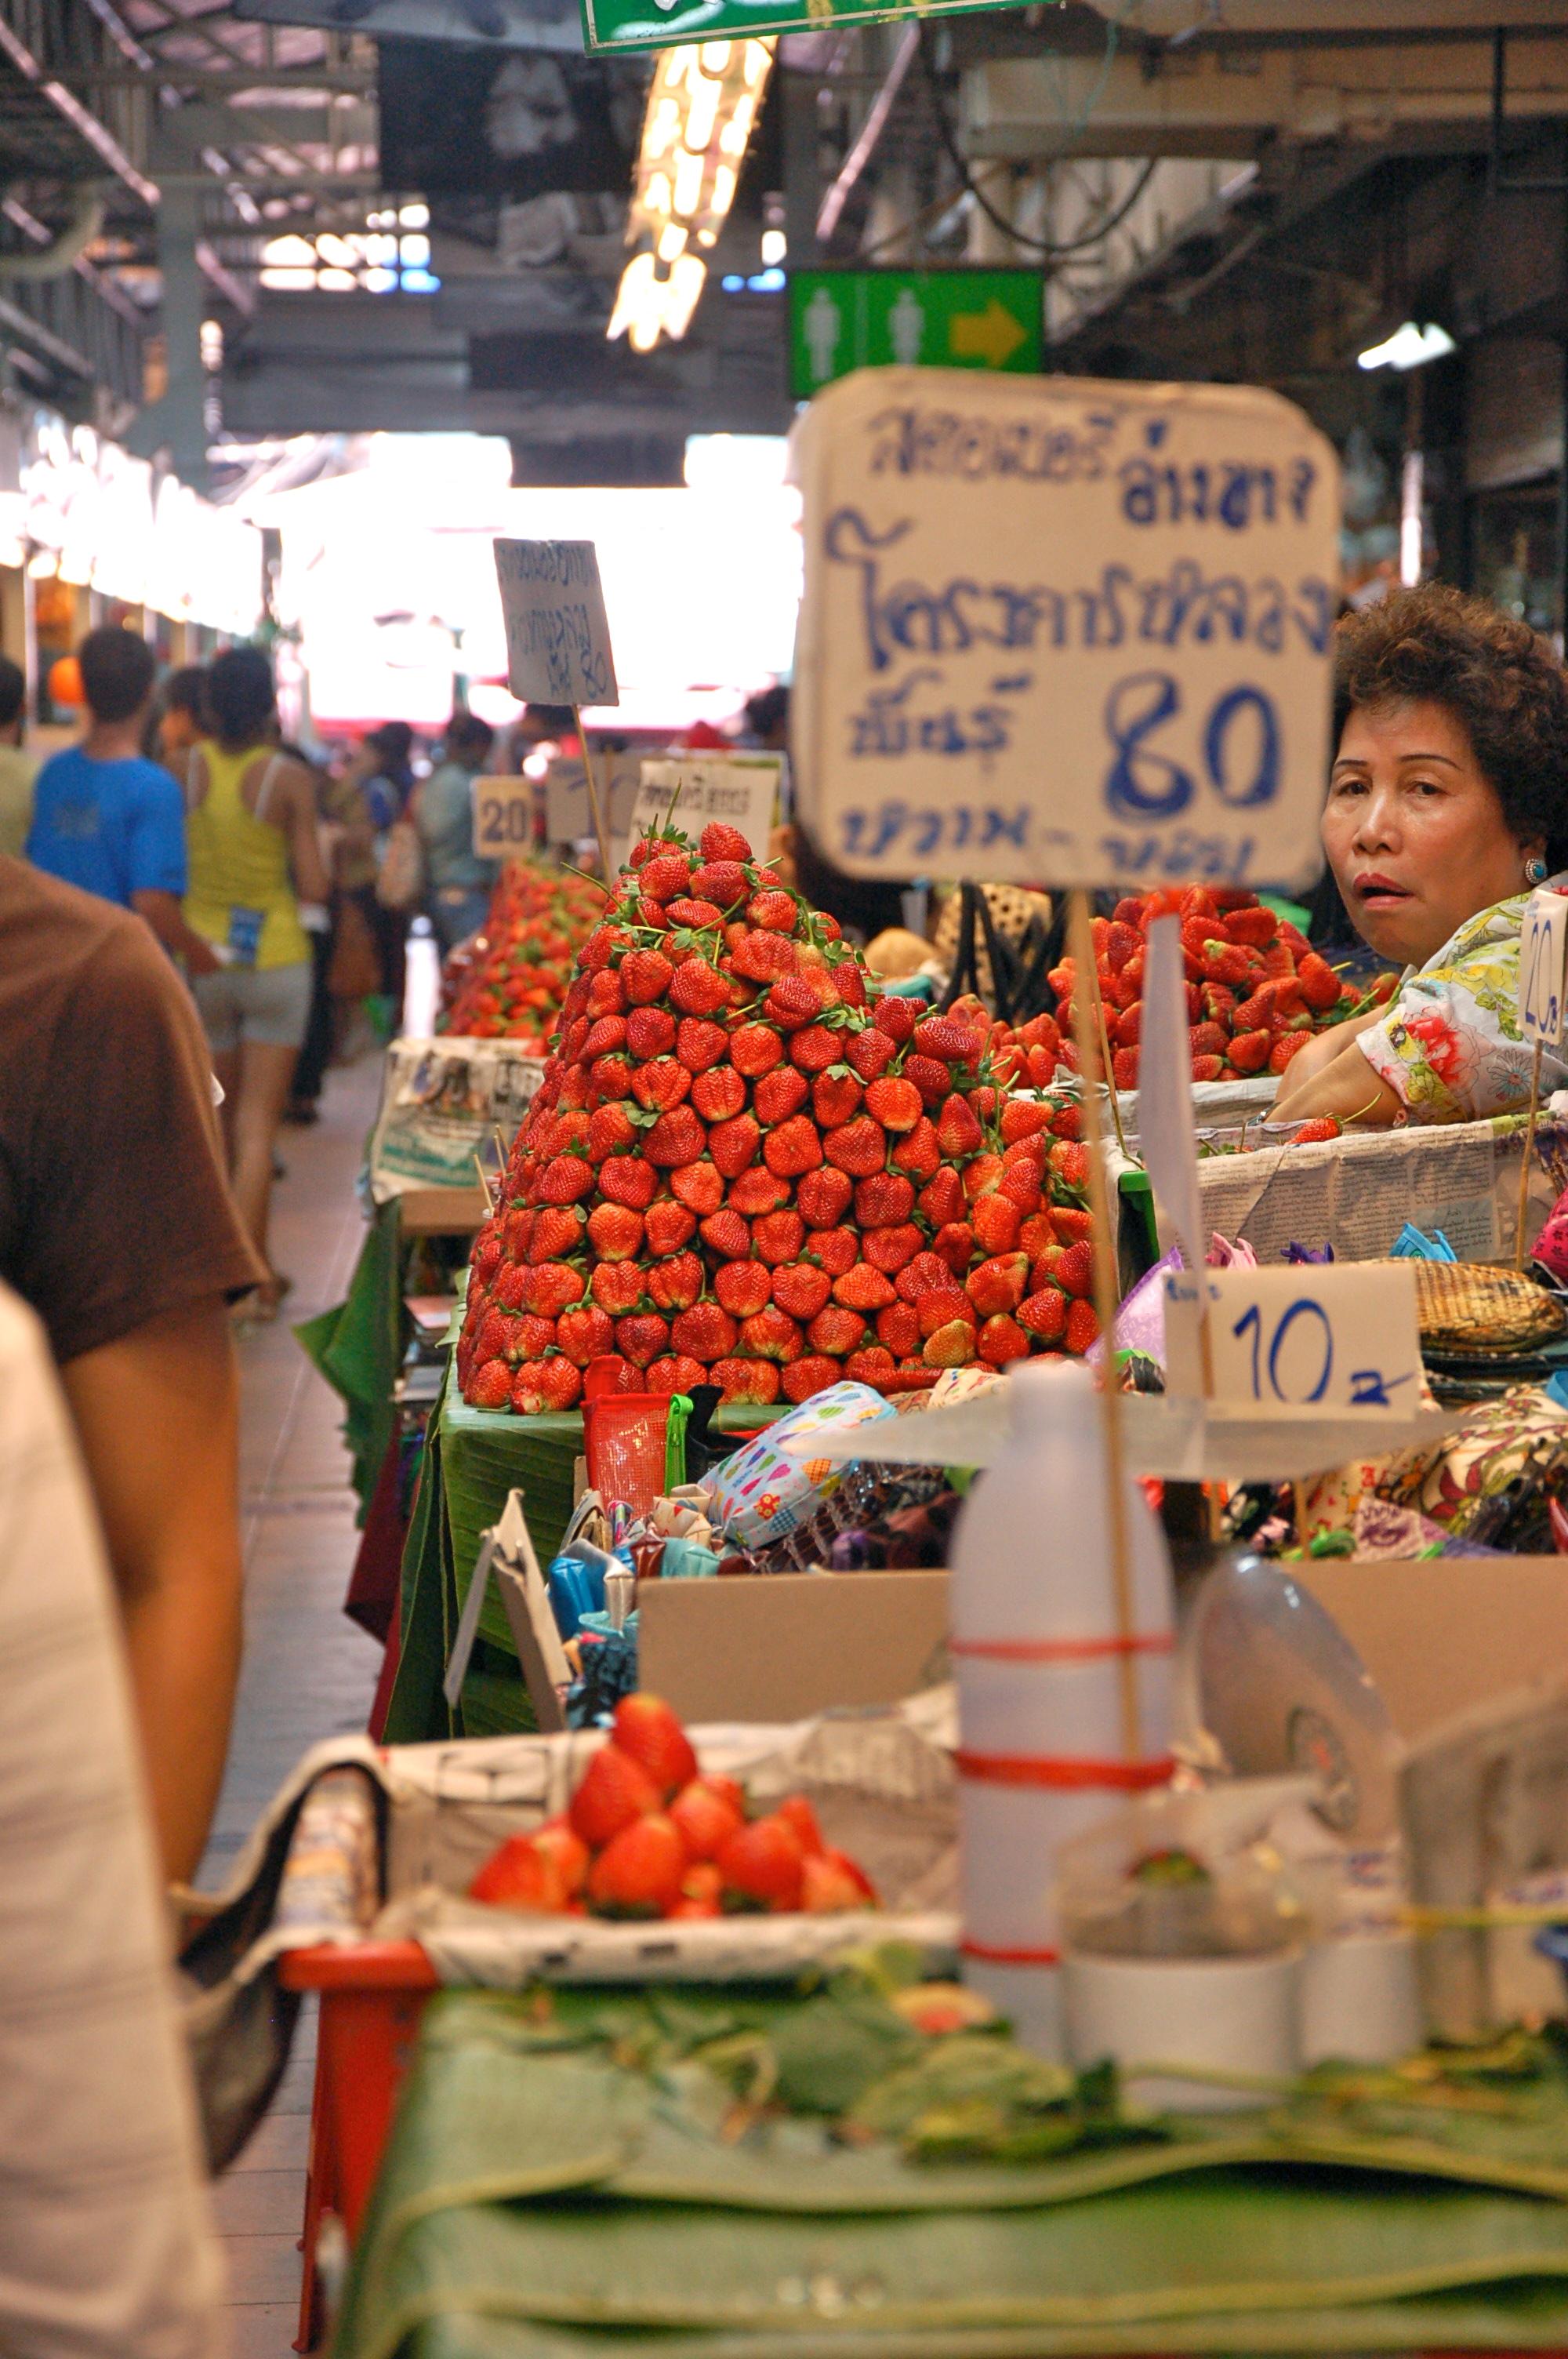 I'll take a dozen strawberries, please! (At Warowot Market)